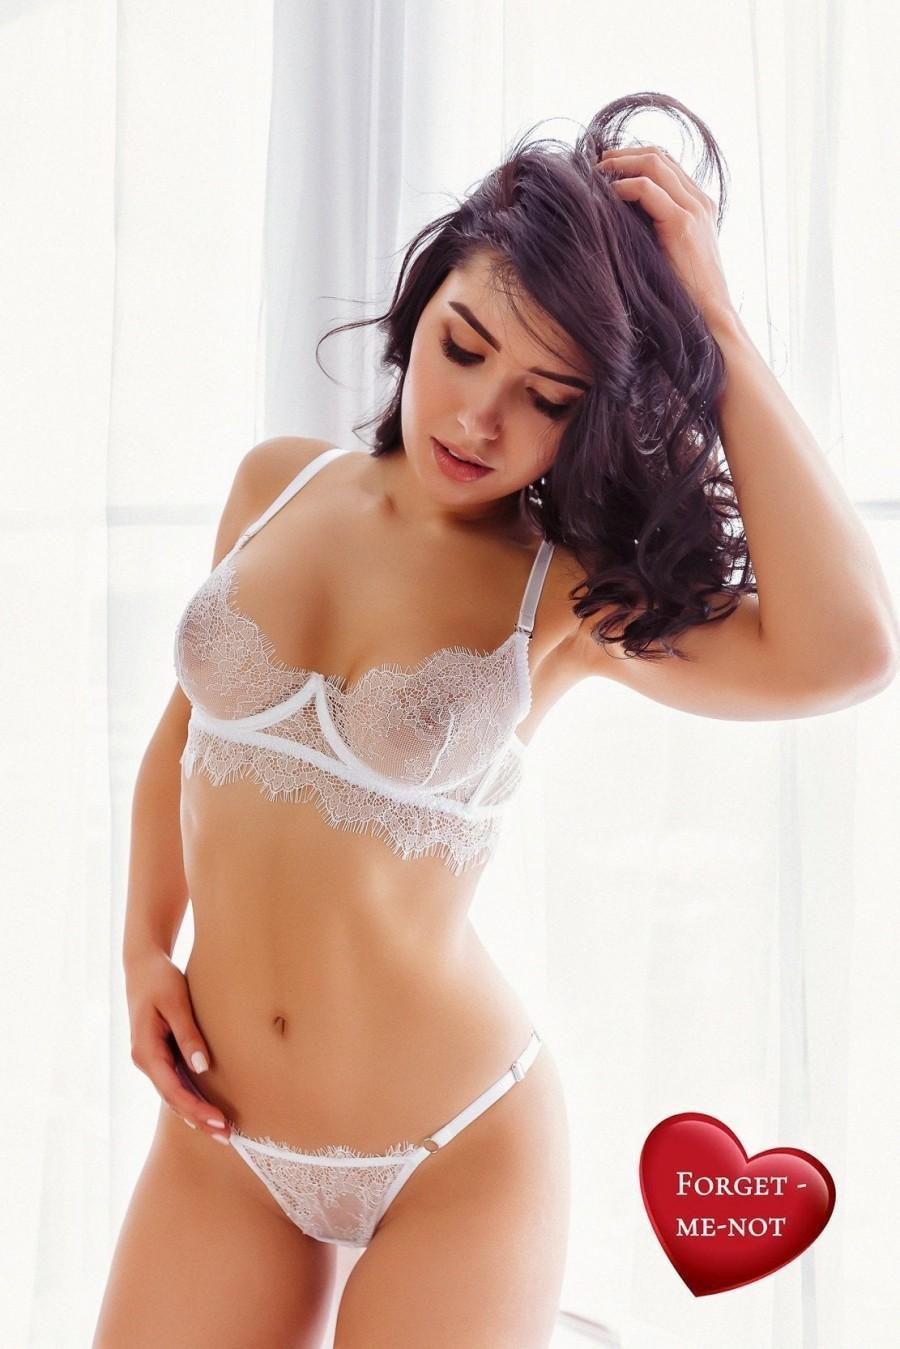 Hochzeit - SEXY LINGERIE, Girlfriend GIFT, Wife Gift, Plus Size Lingerie, Bridal Lingerie Set, See Through Bra, Sheer Panties, Sexy Bra, Garter, Sheer